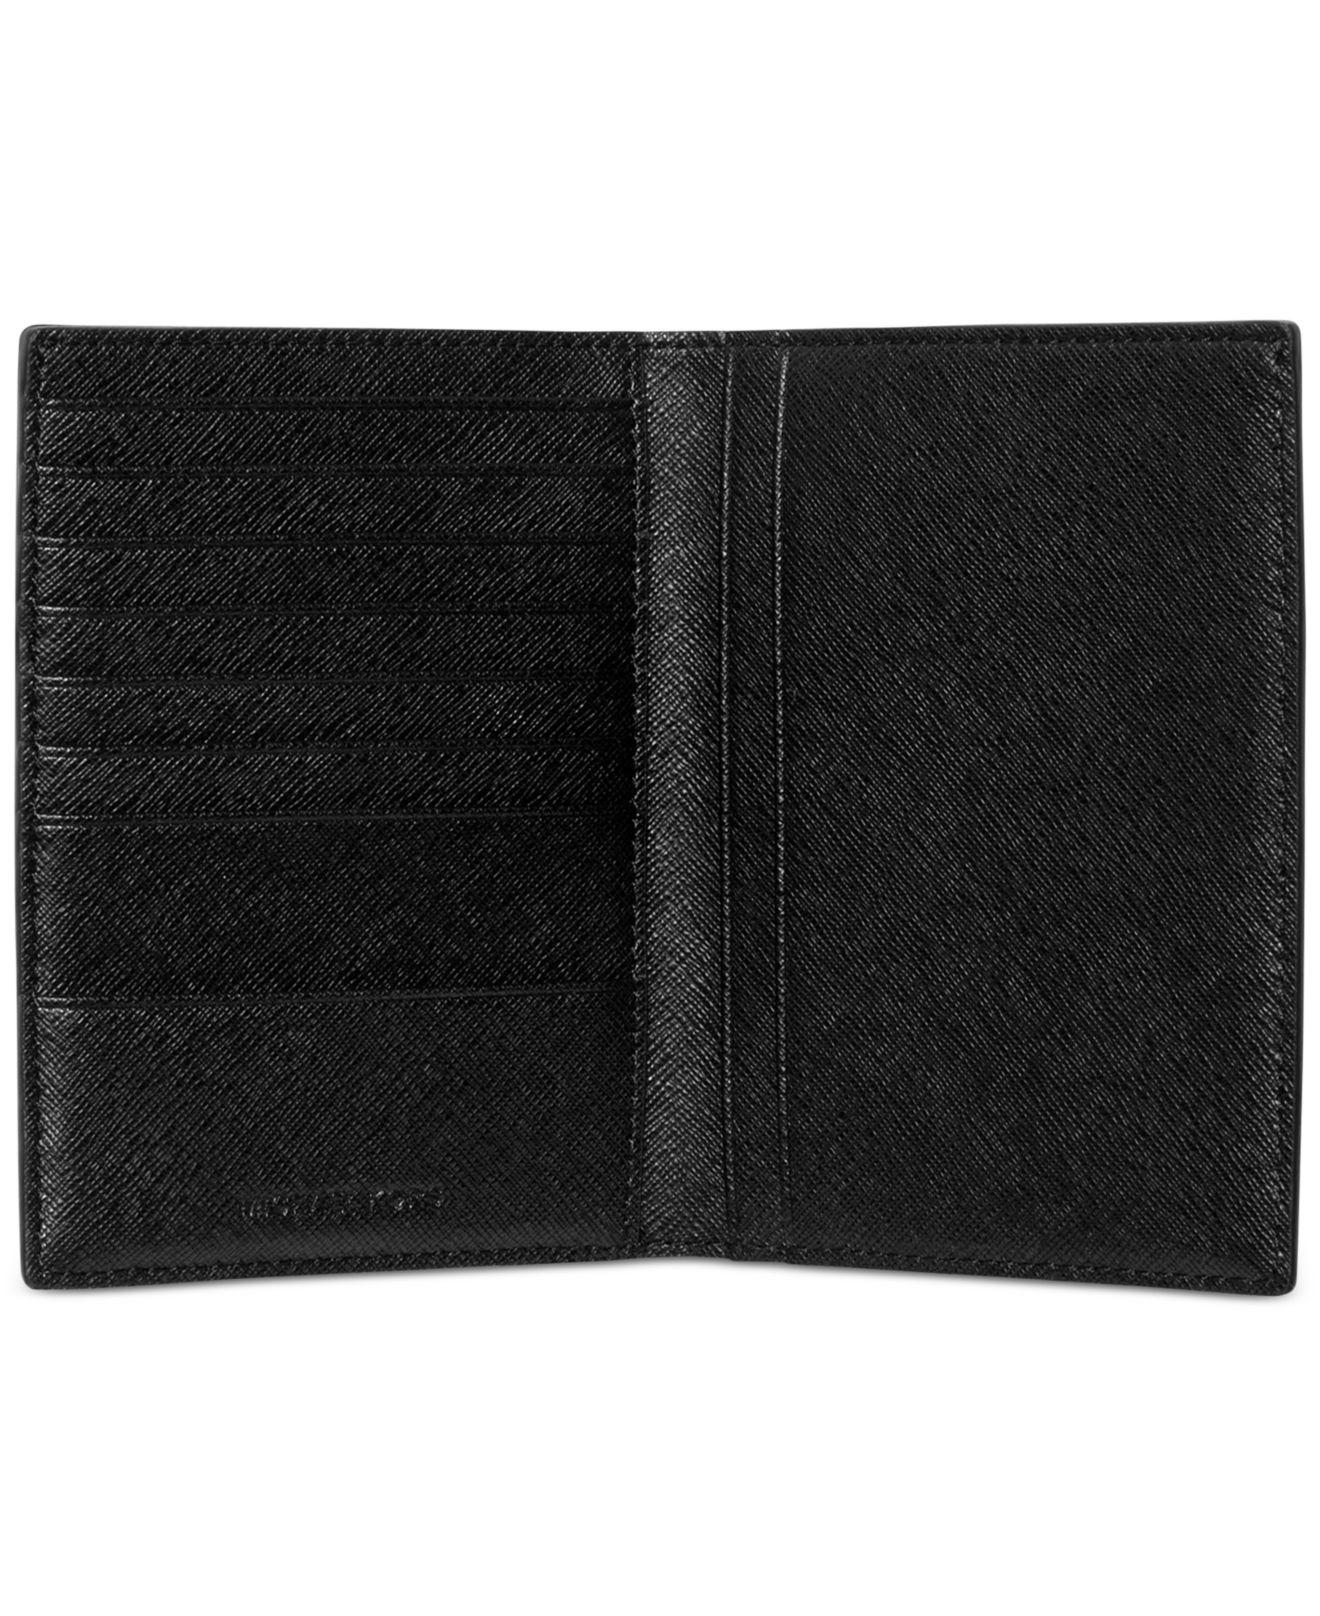 b4ee7c0d44fd Michael Kors Jet Set Saffiano Leather Passport Card Holder in Black ...